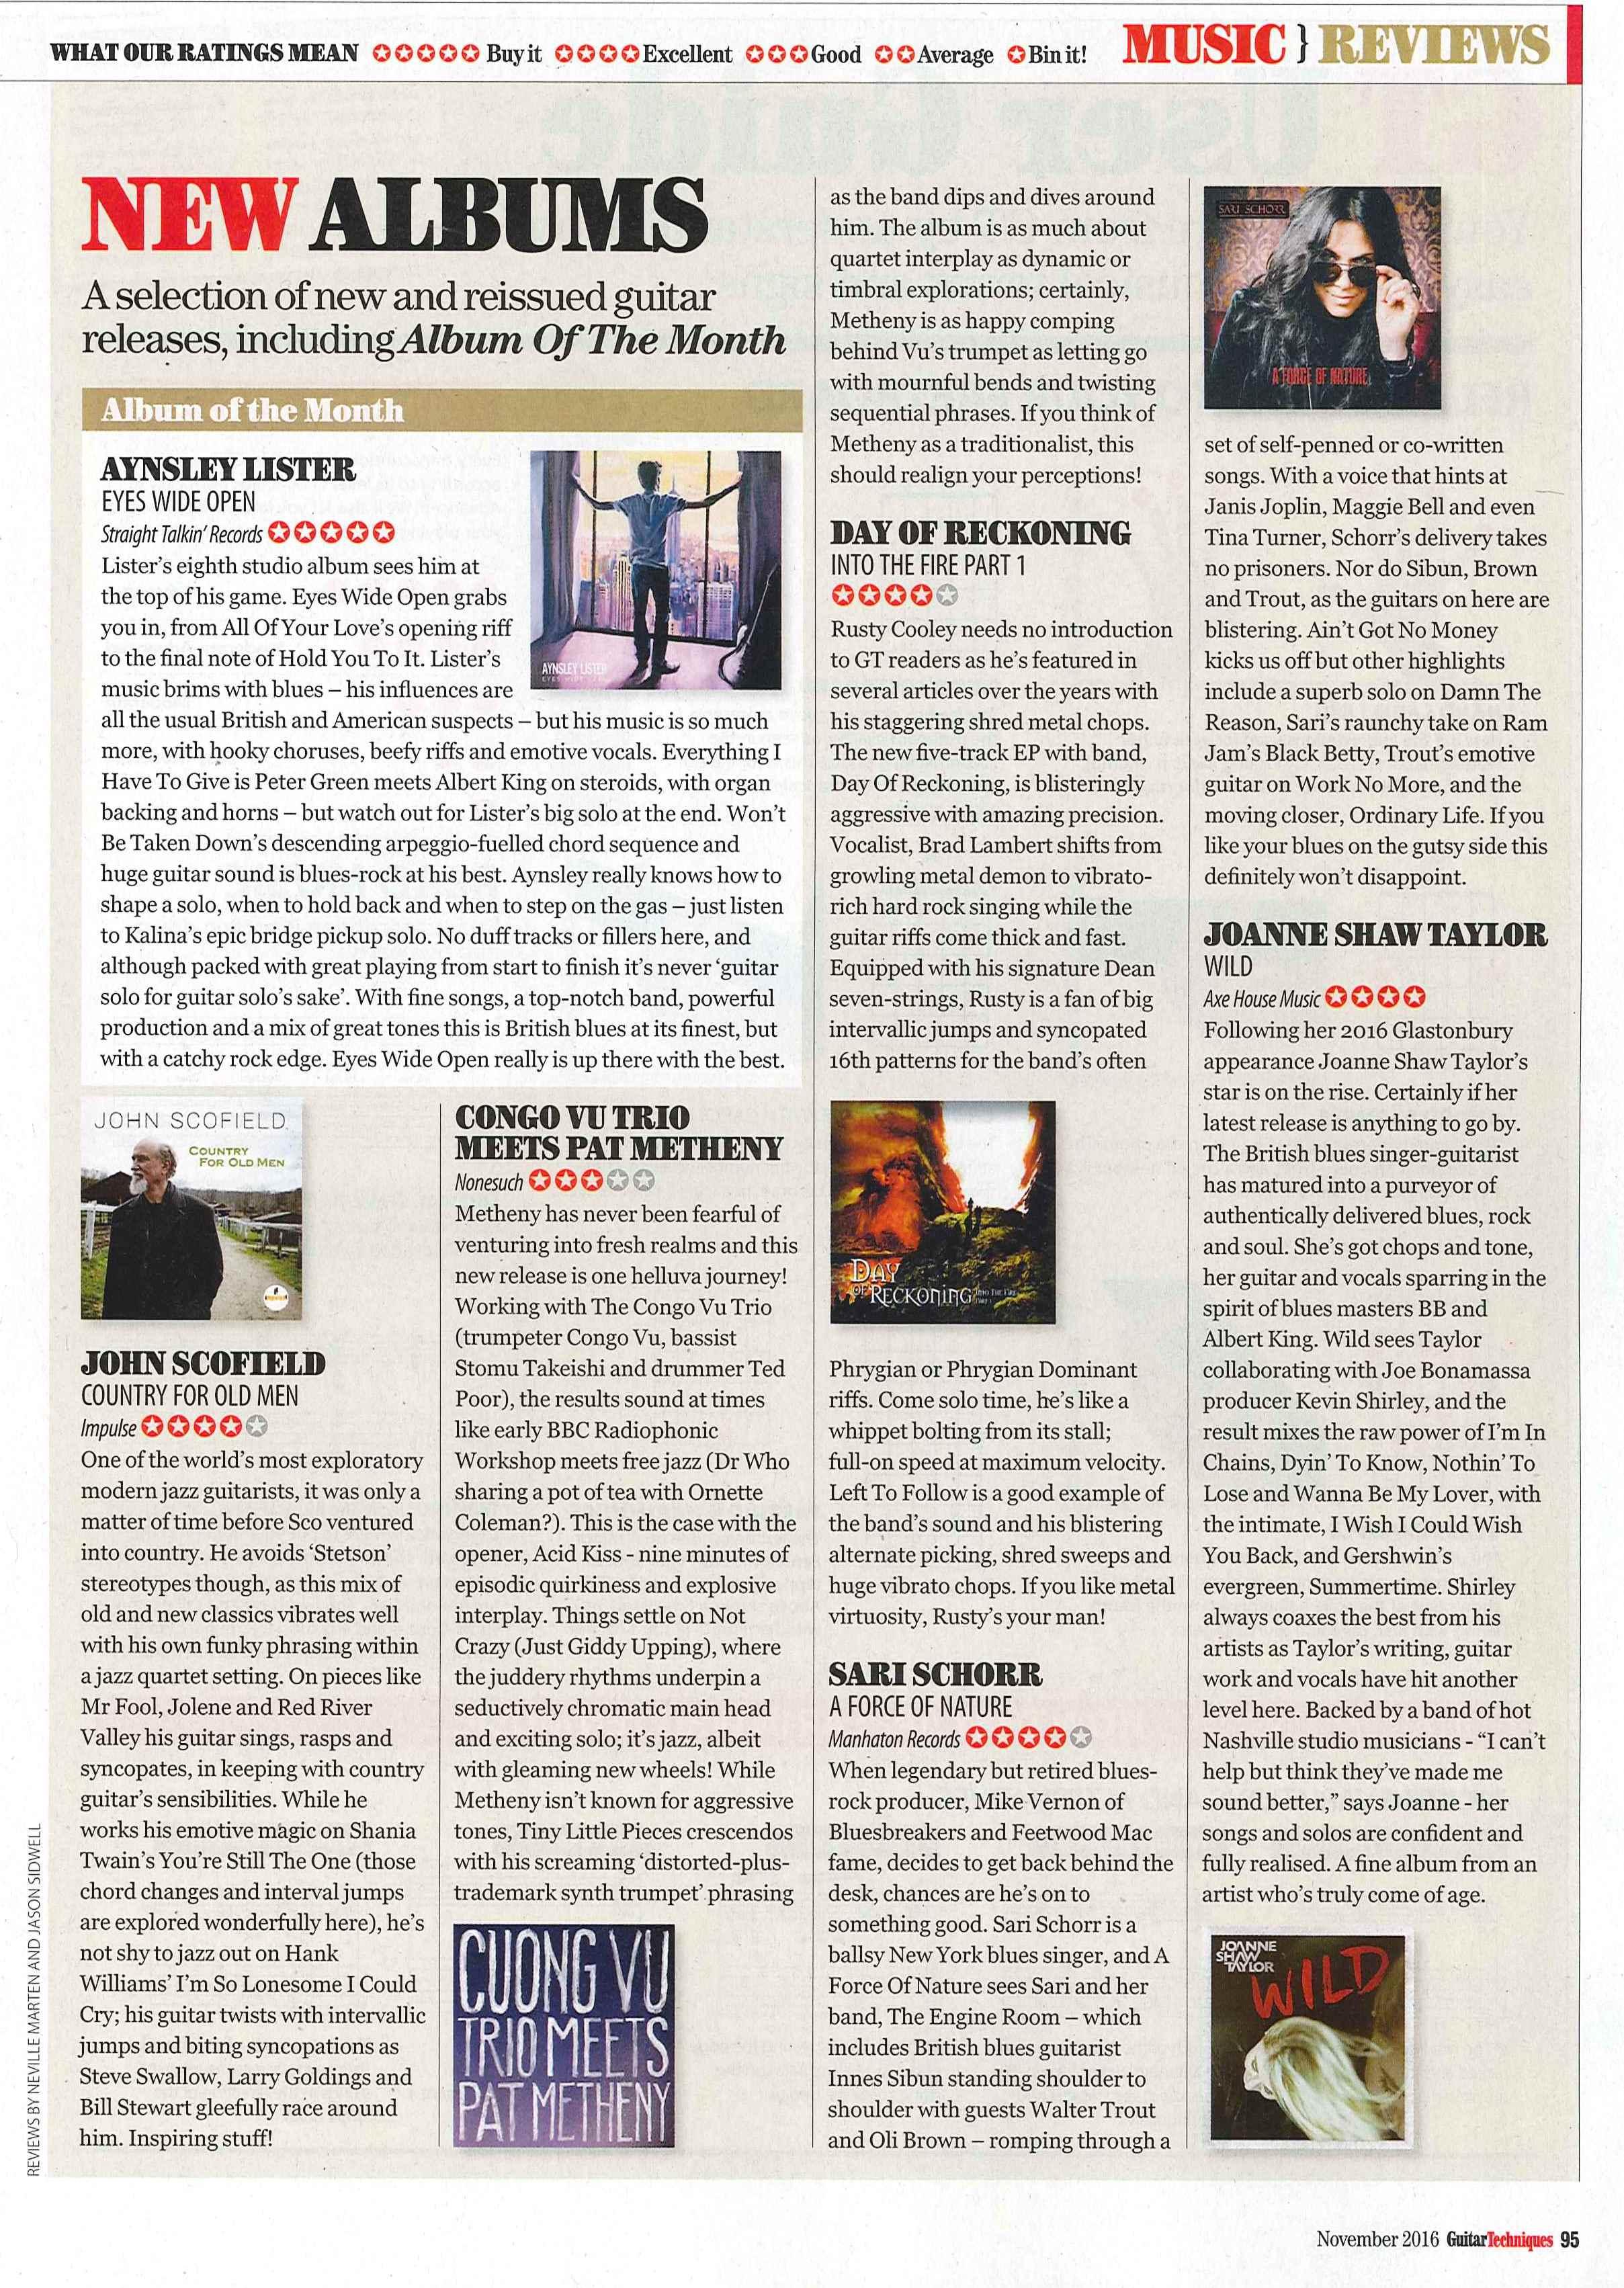 Guitar Techniques_November 2016_Sari Schorr_album review_2.jpg